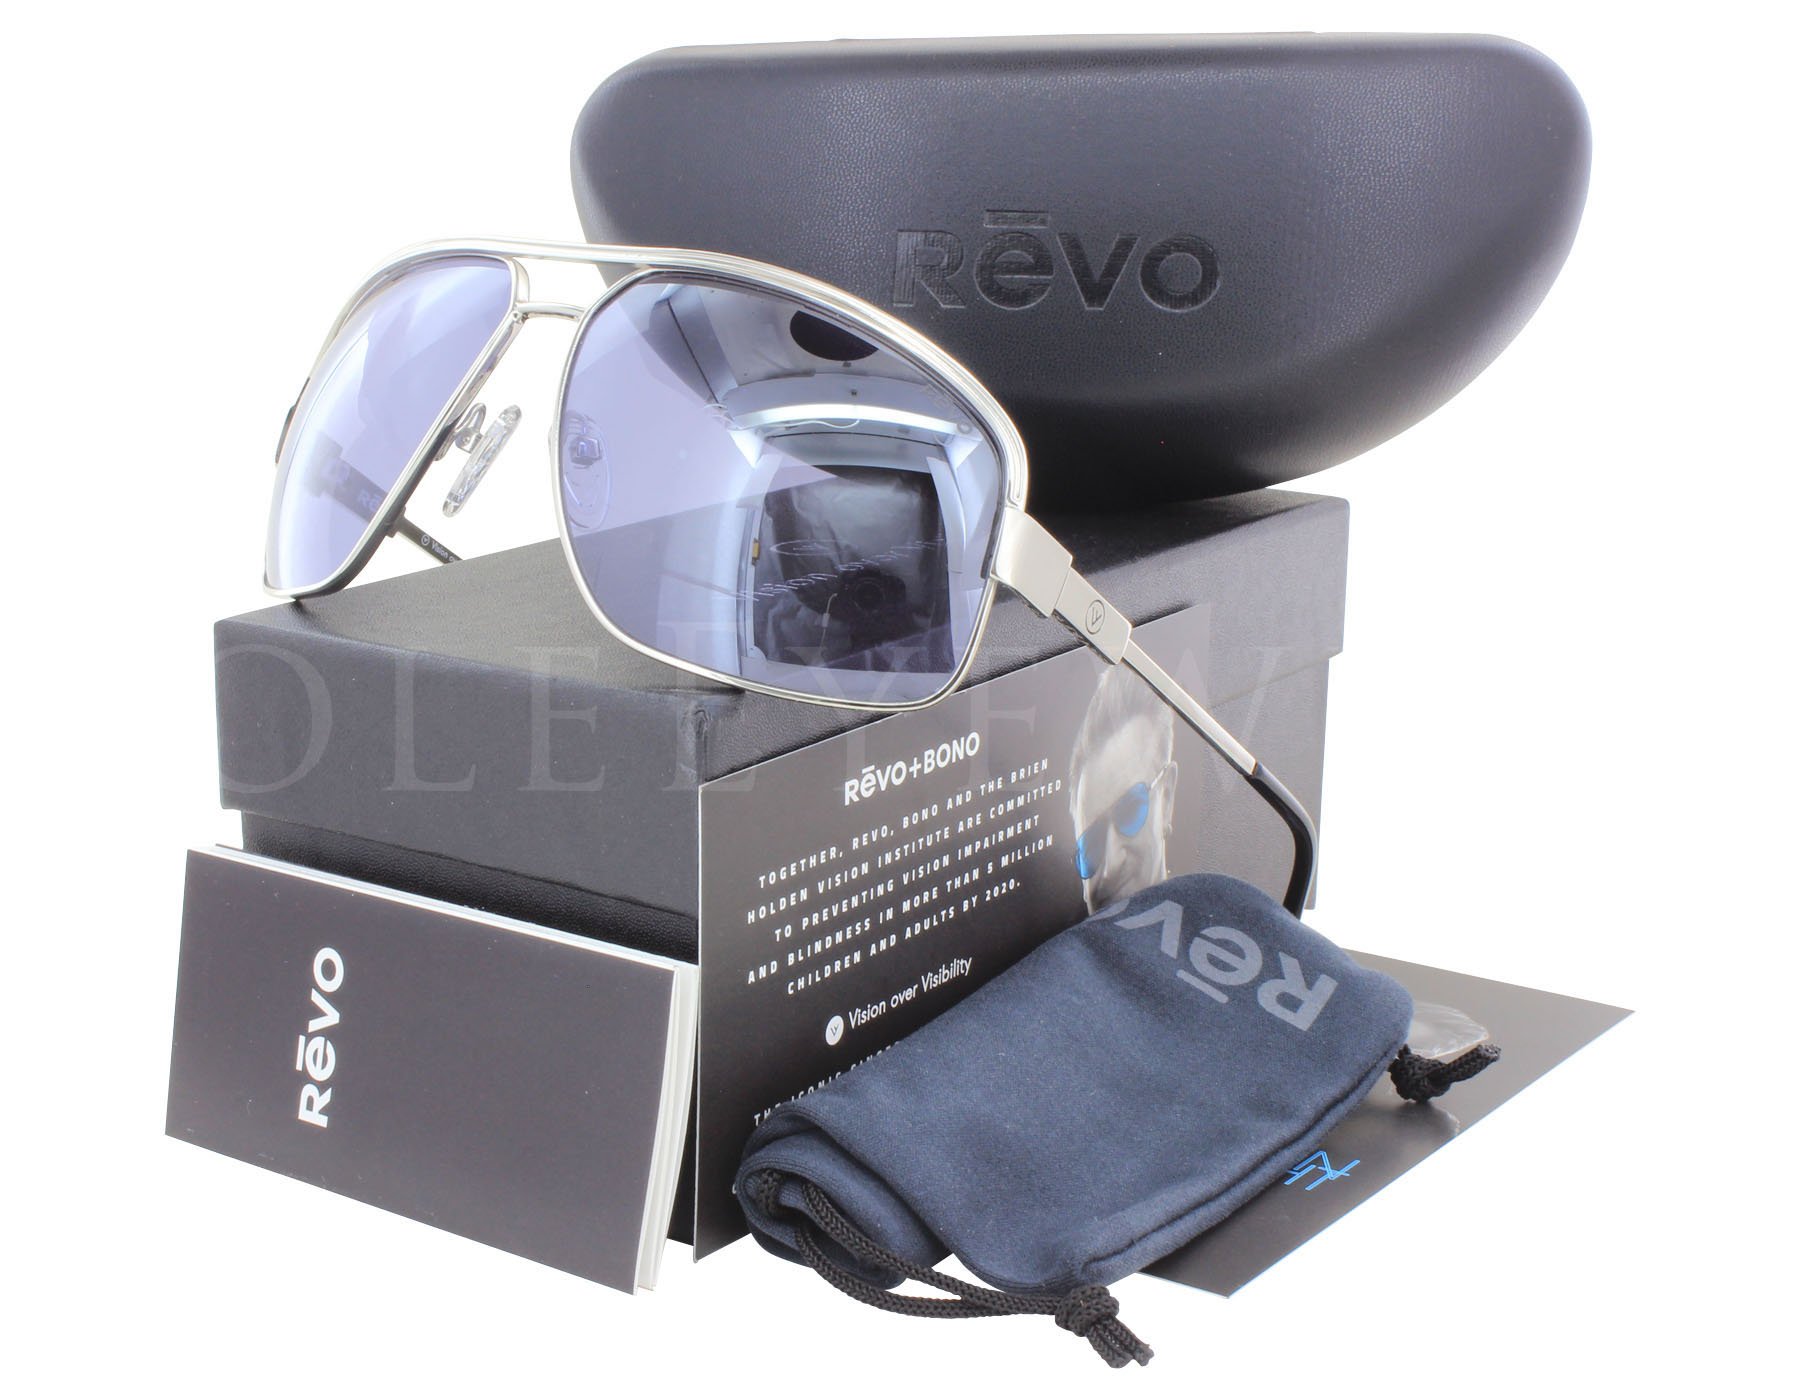 d449bb9eb7 Details about NEW Revo Stargazer RE 1002 03 BLV Silver   Purple Sunglasses